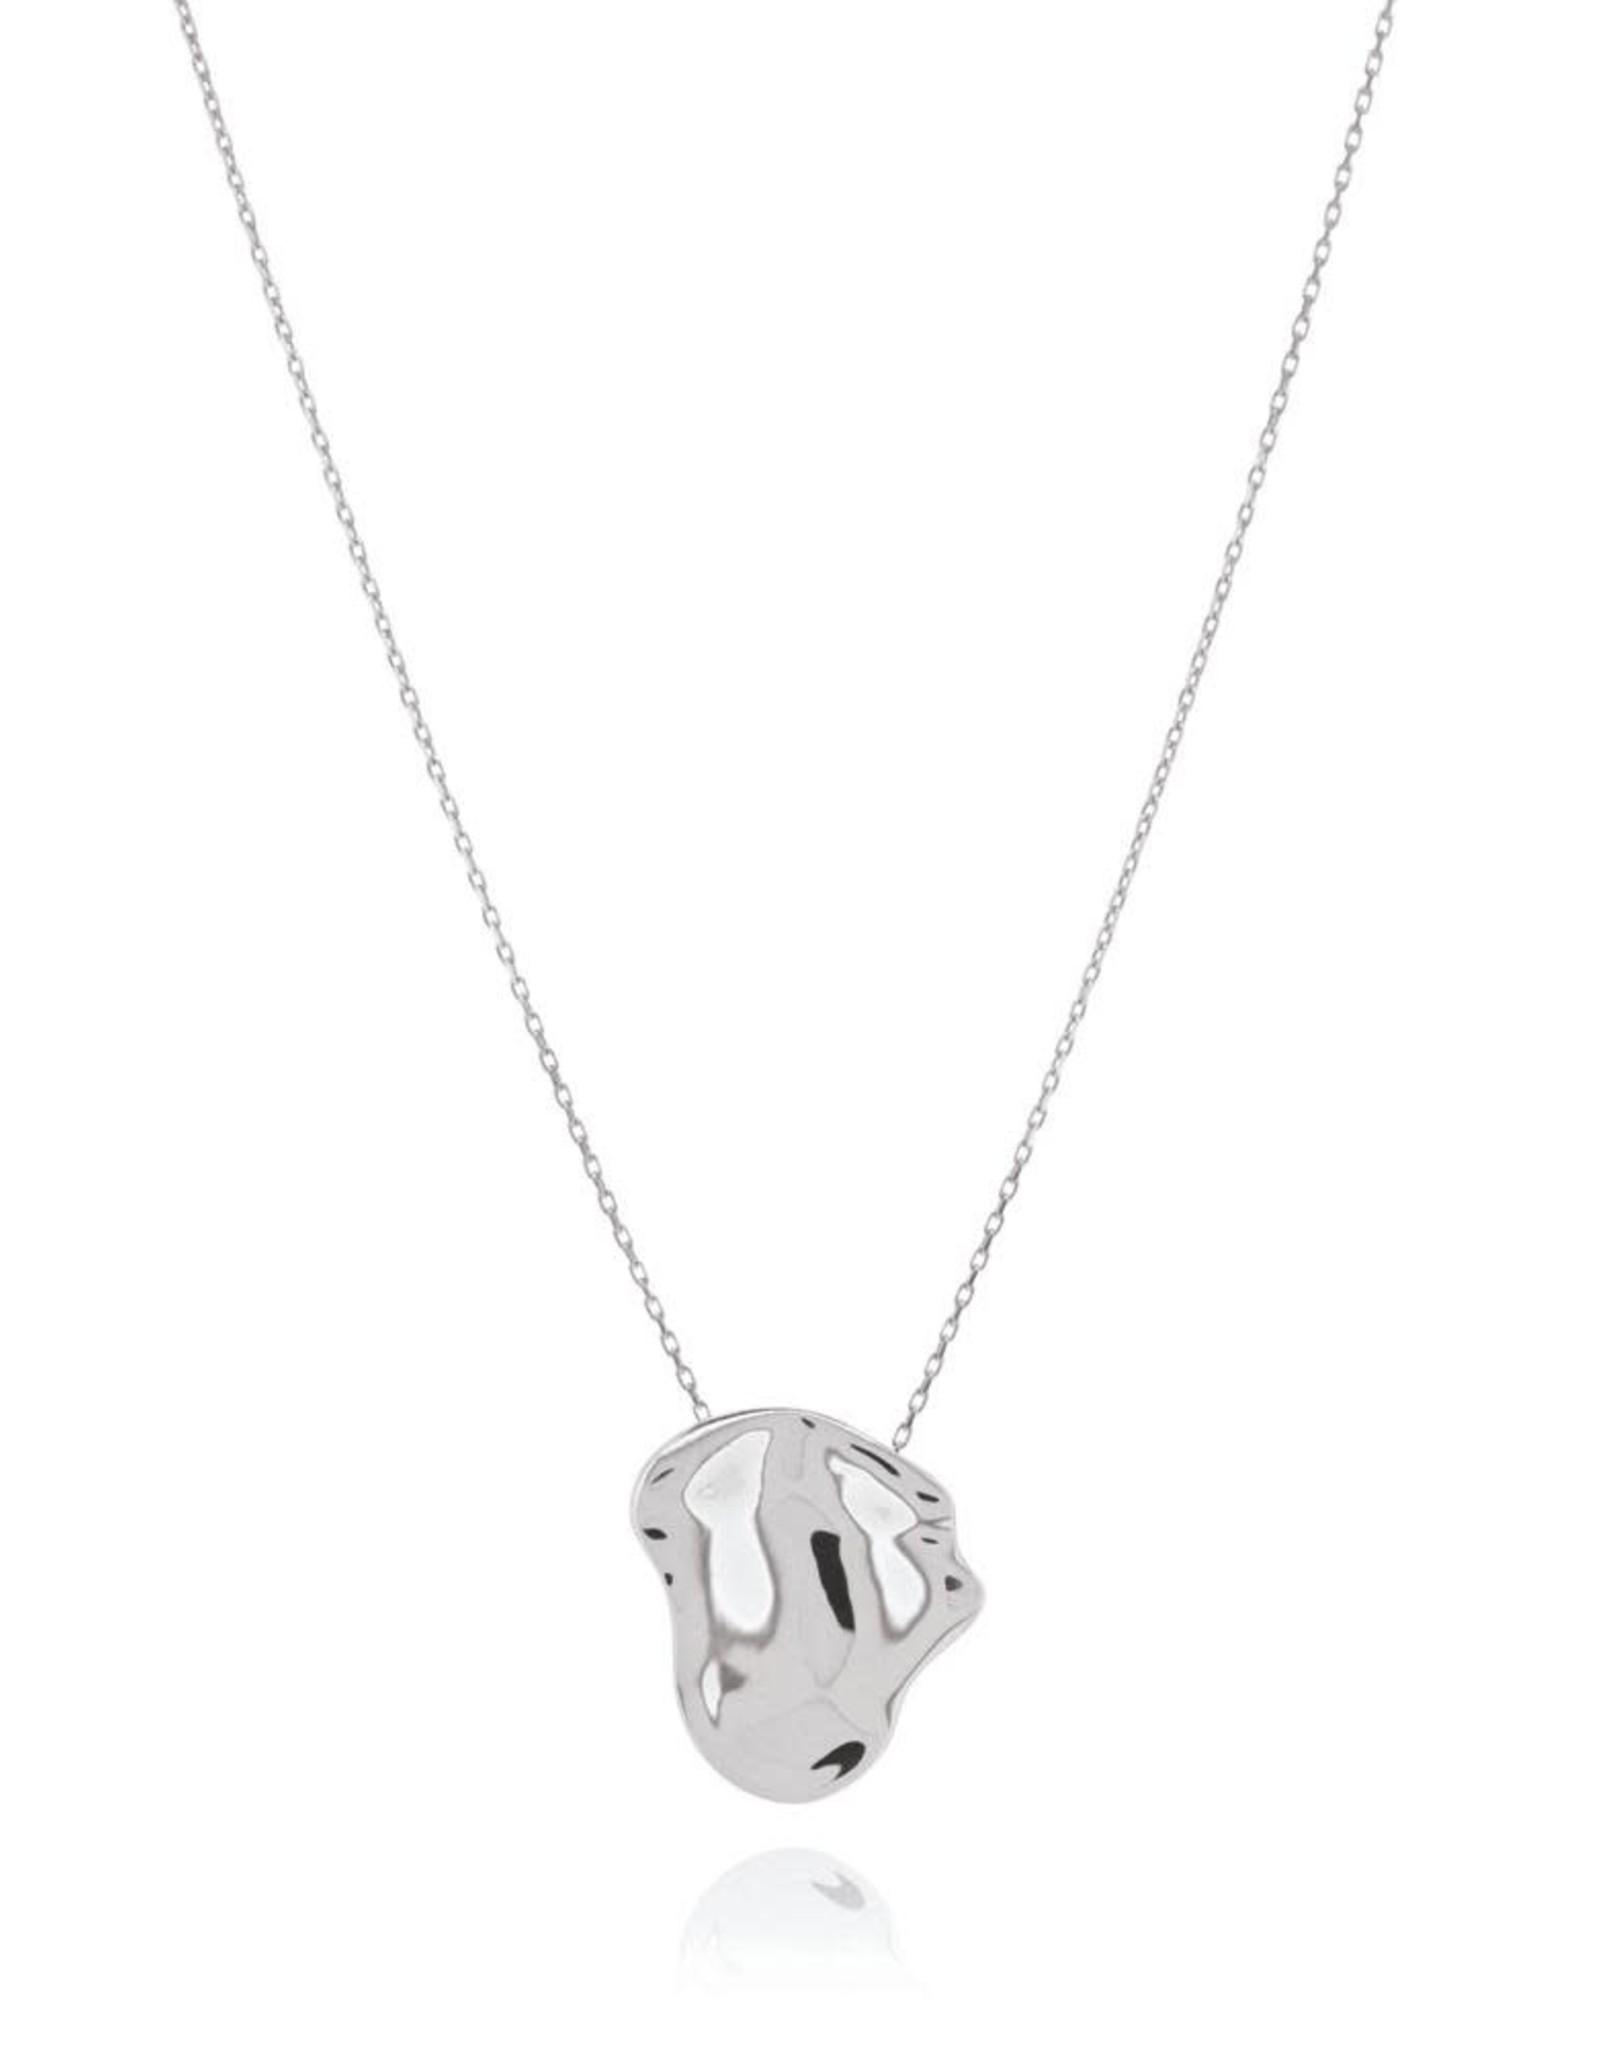 Linda Tahija Morphe Necklace, Silver